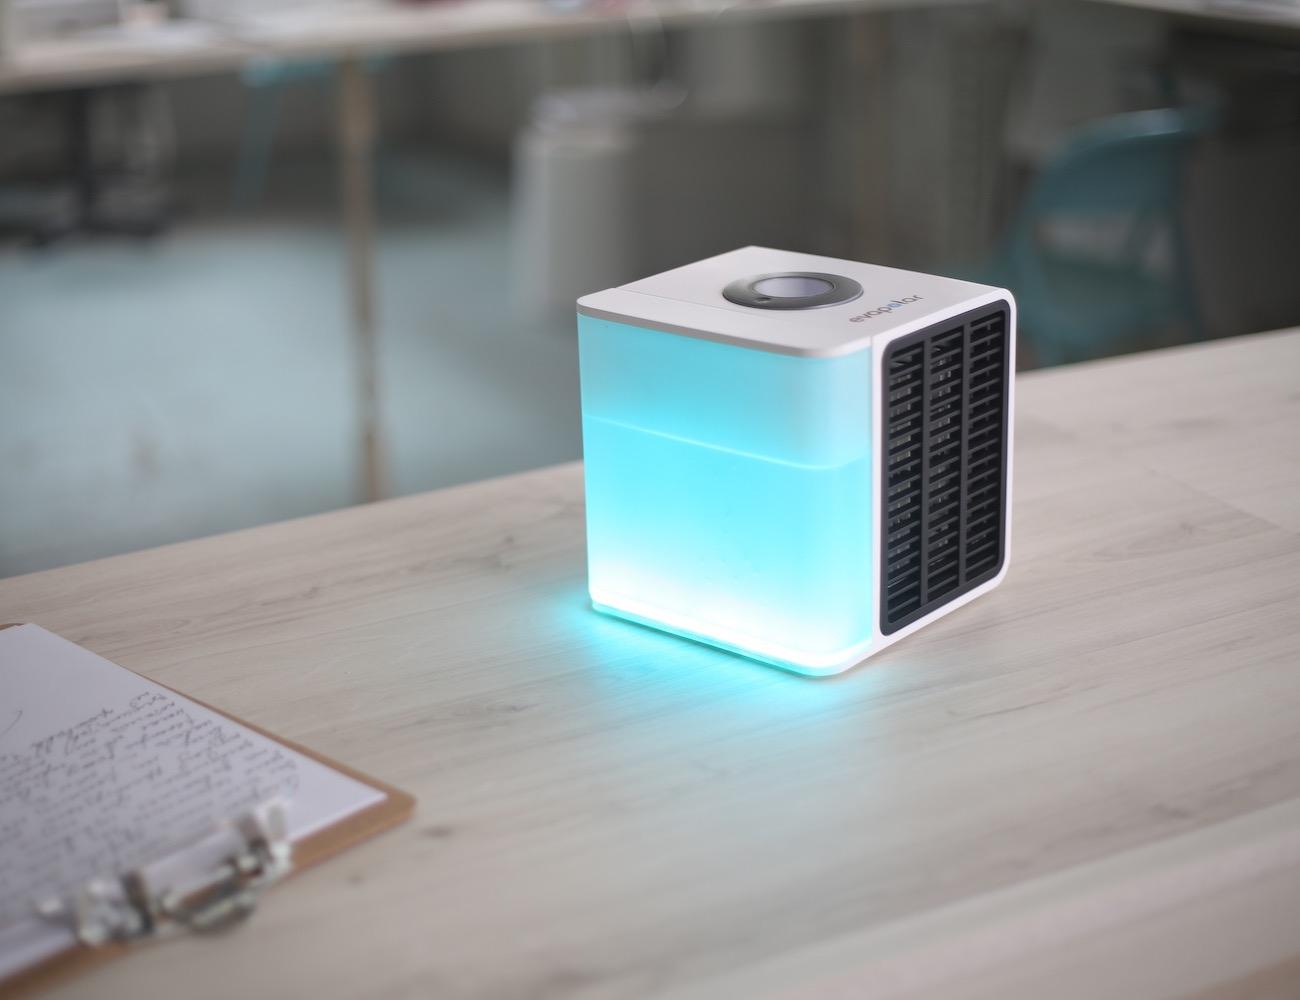 EVAPOLAR Mobilni klima uređaj kojim kreirate vlastiti mikrosvemir